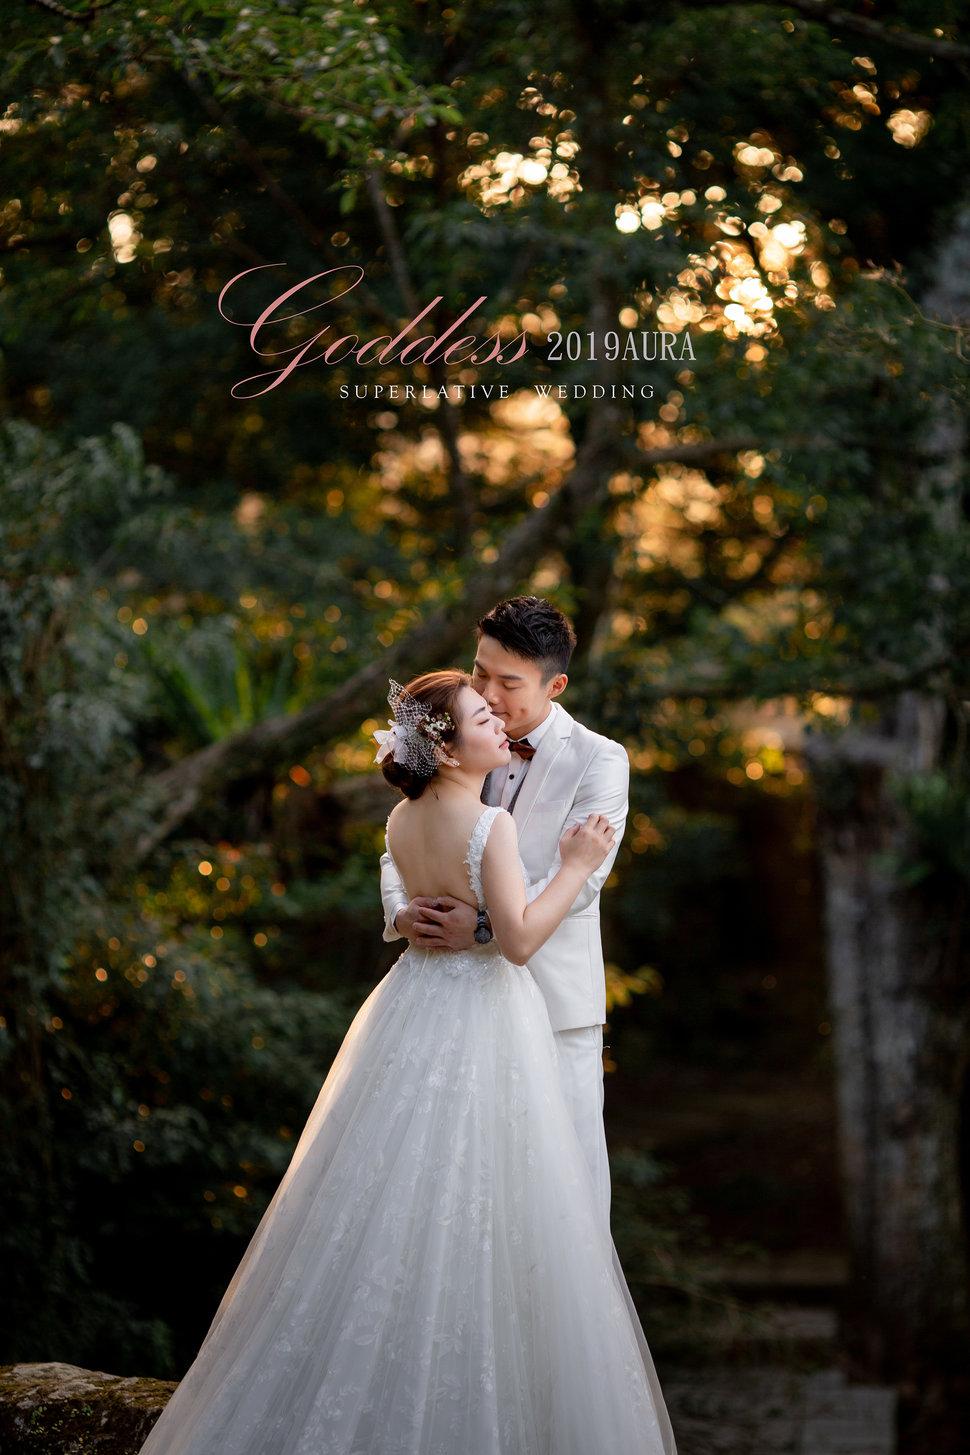 _U_S4571 (2) - 奧拉最上婚紗攝影《結婚吧》